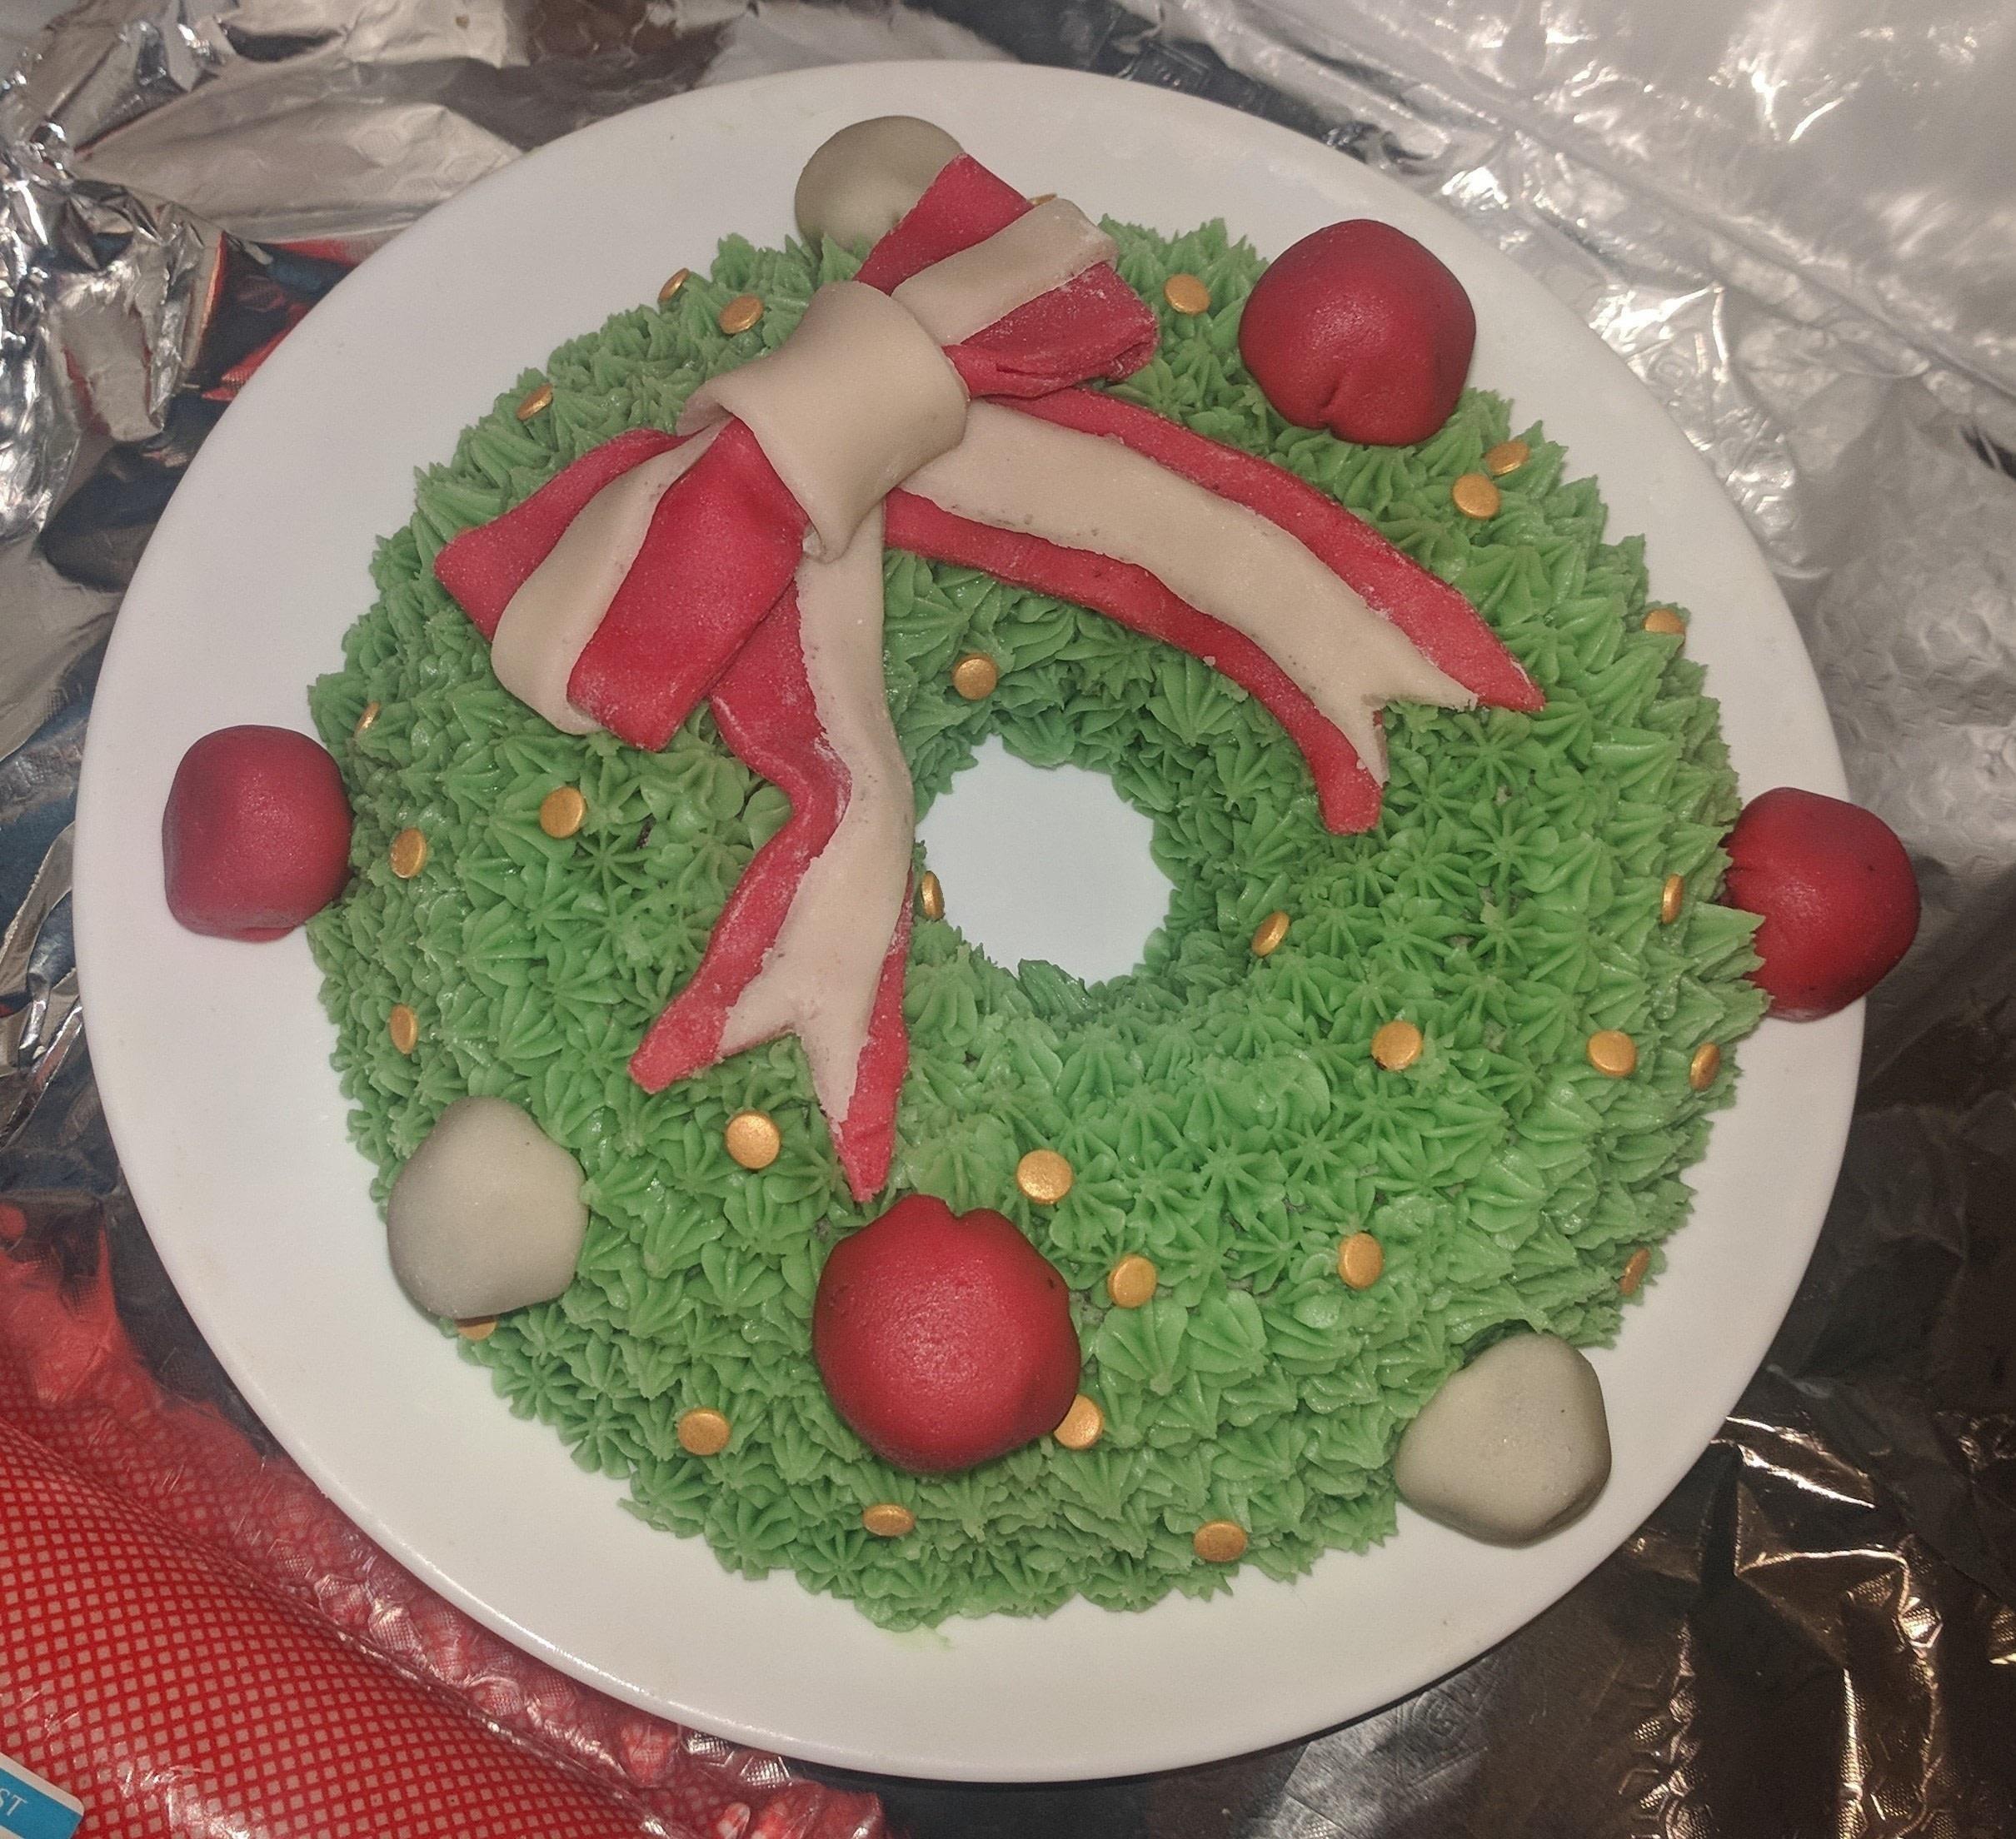 Christmas Wreath Cake · How To Bake A Bundt Cake · Recipes